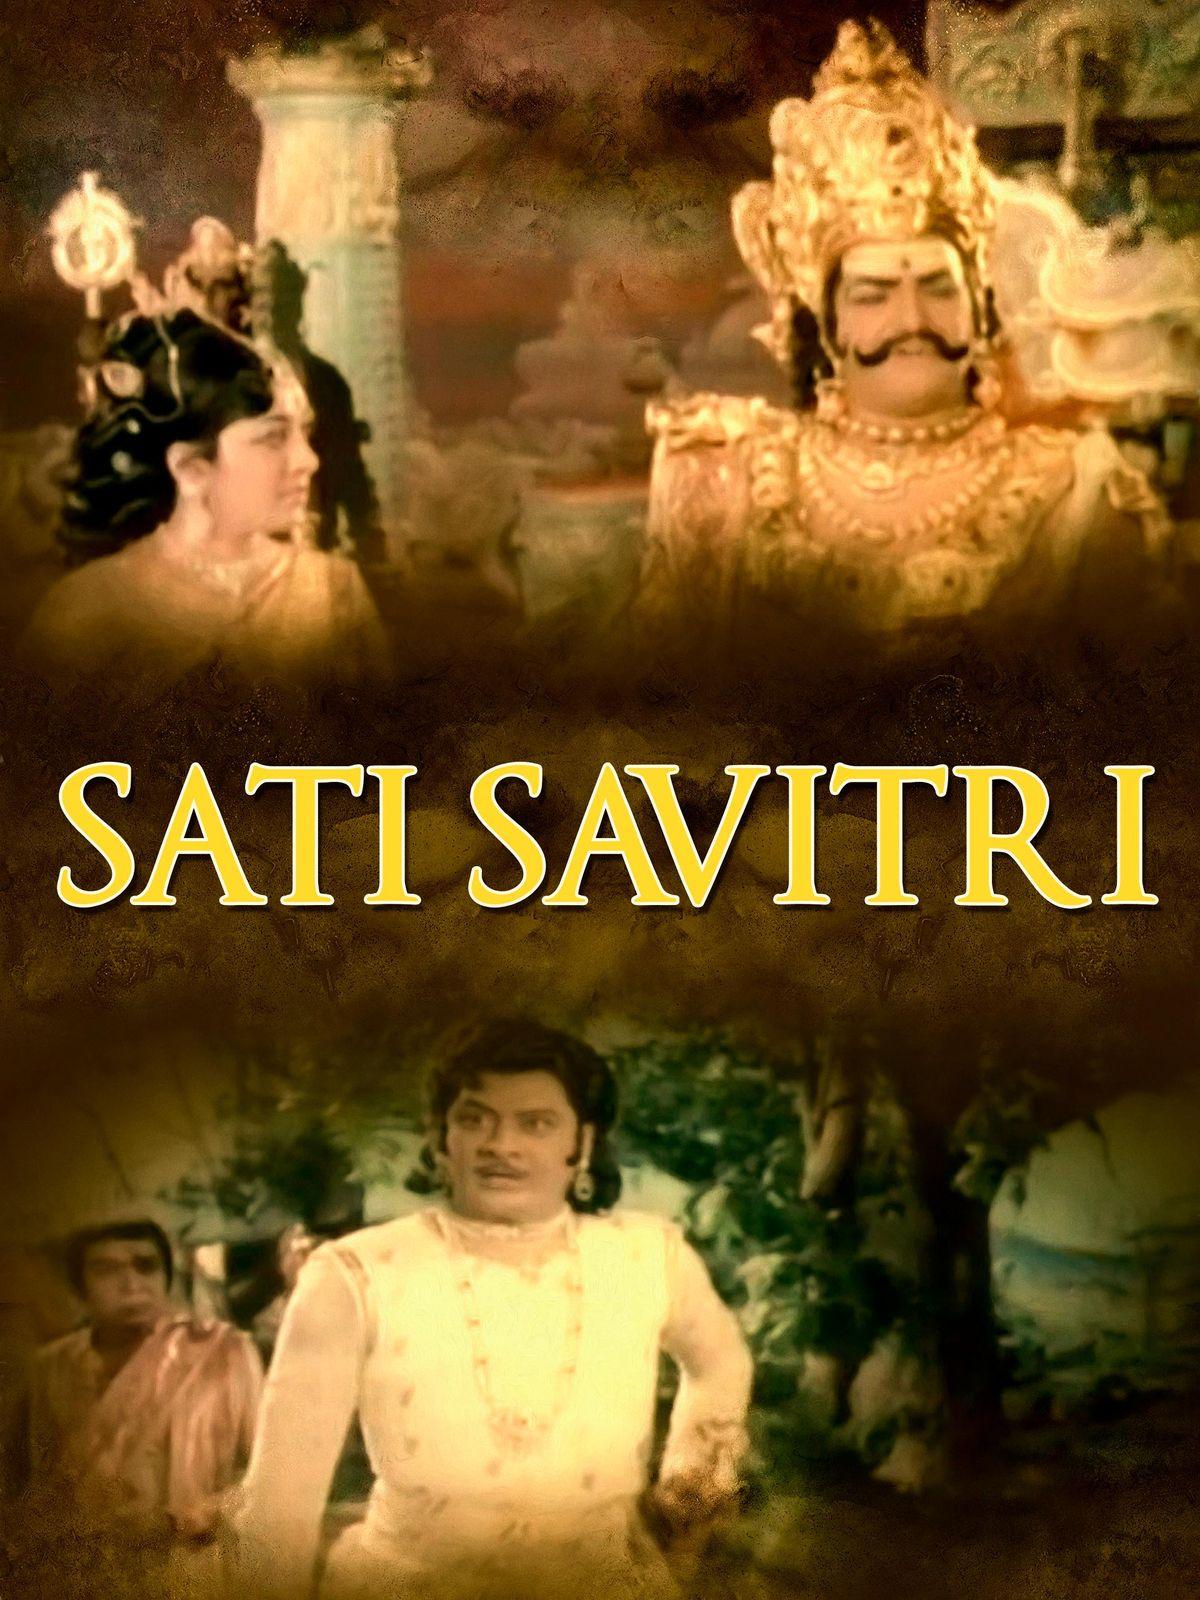 Kadaru Nagabhushanam Best Movies, TV Shows and Web Series List